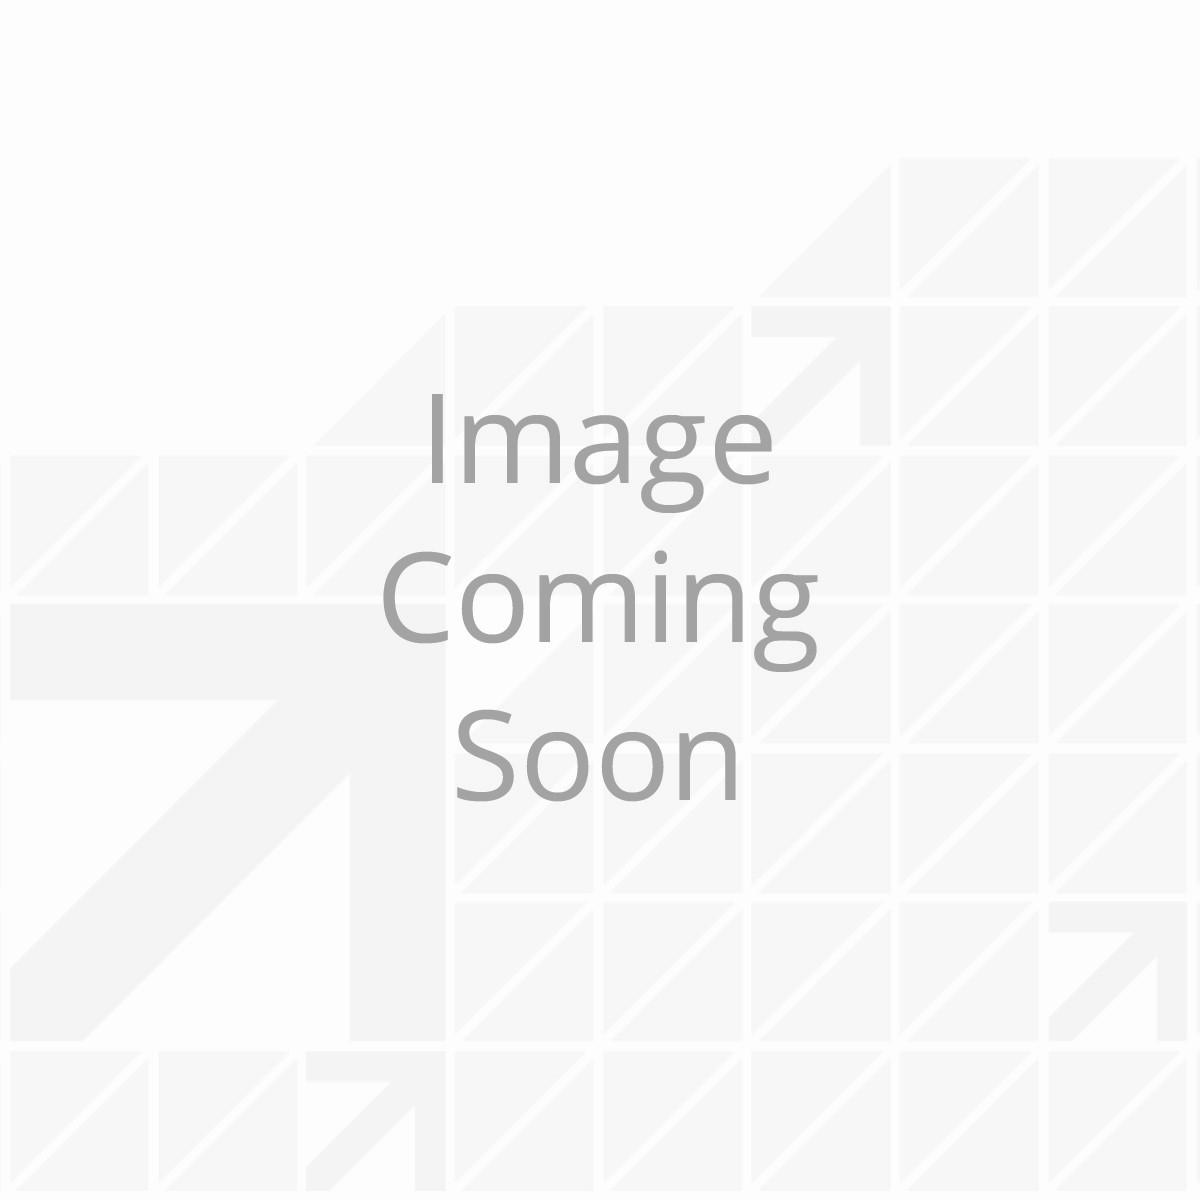 17' Power & Hybrid Awning Roller Assembly - Prepflex Sand Fade